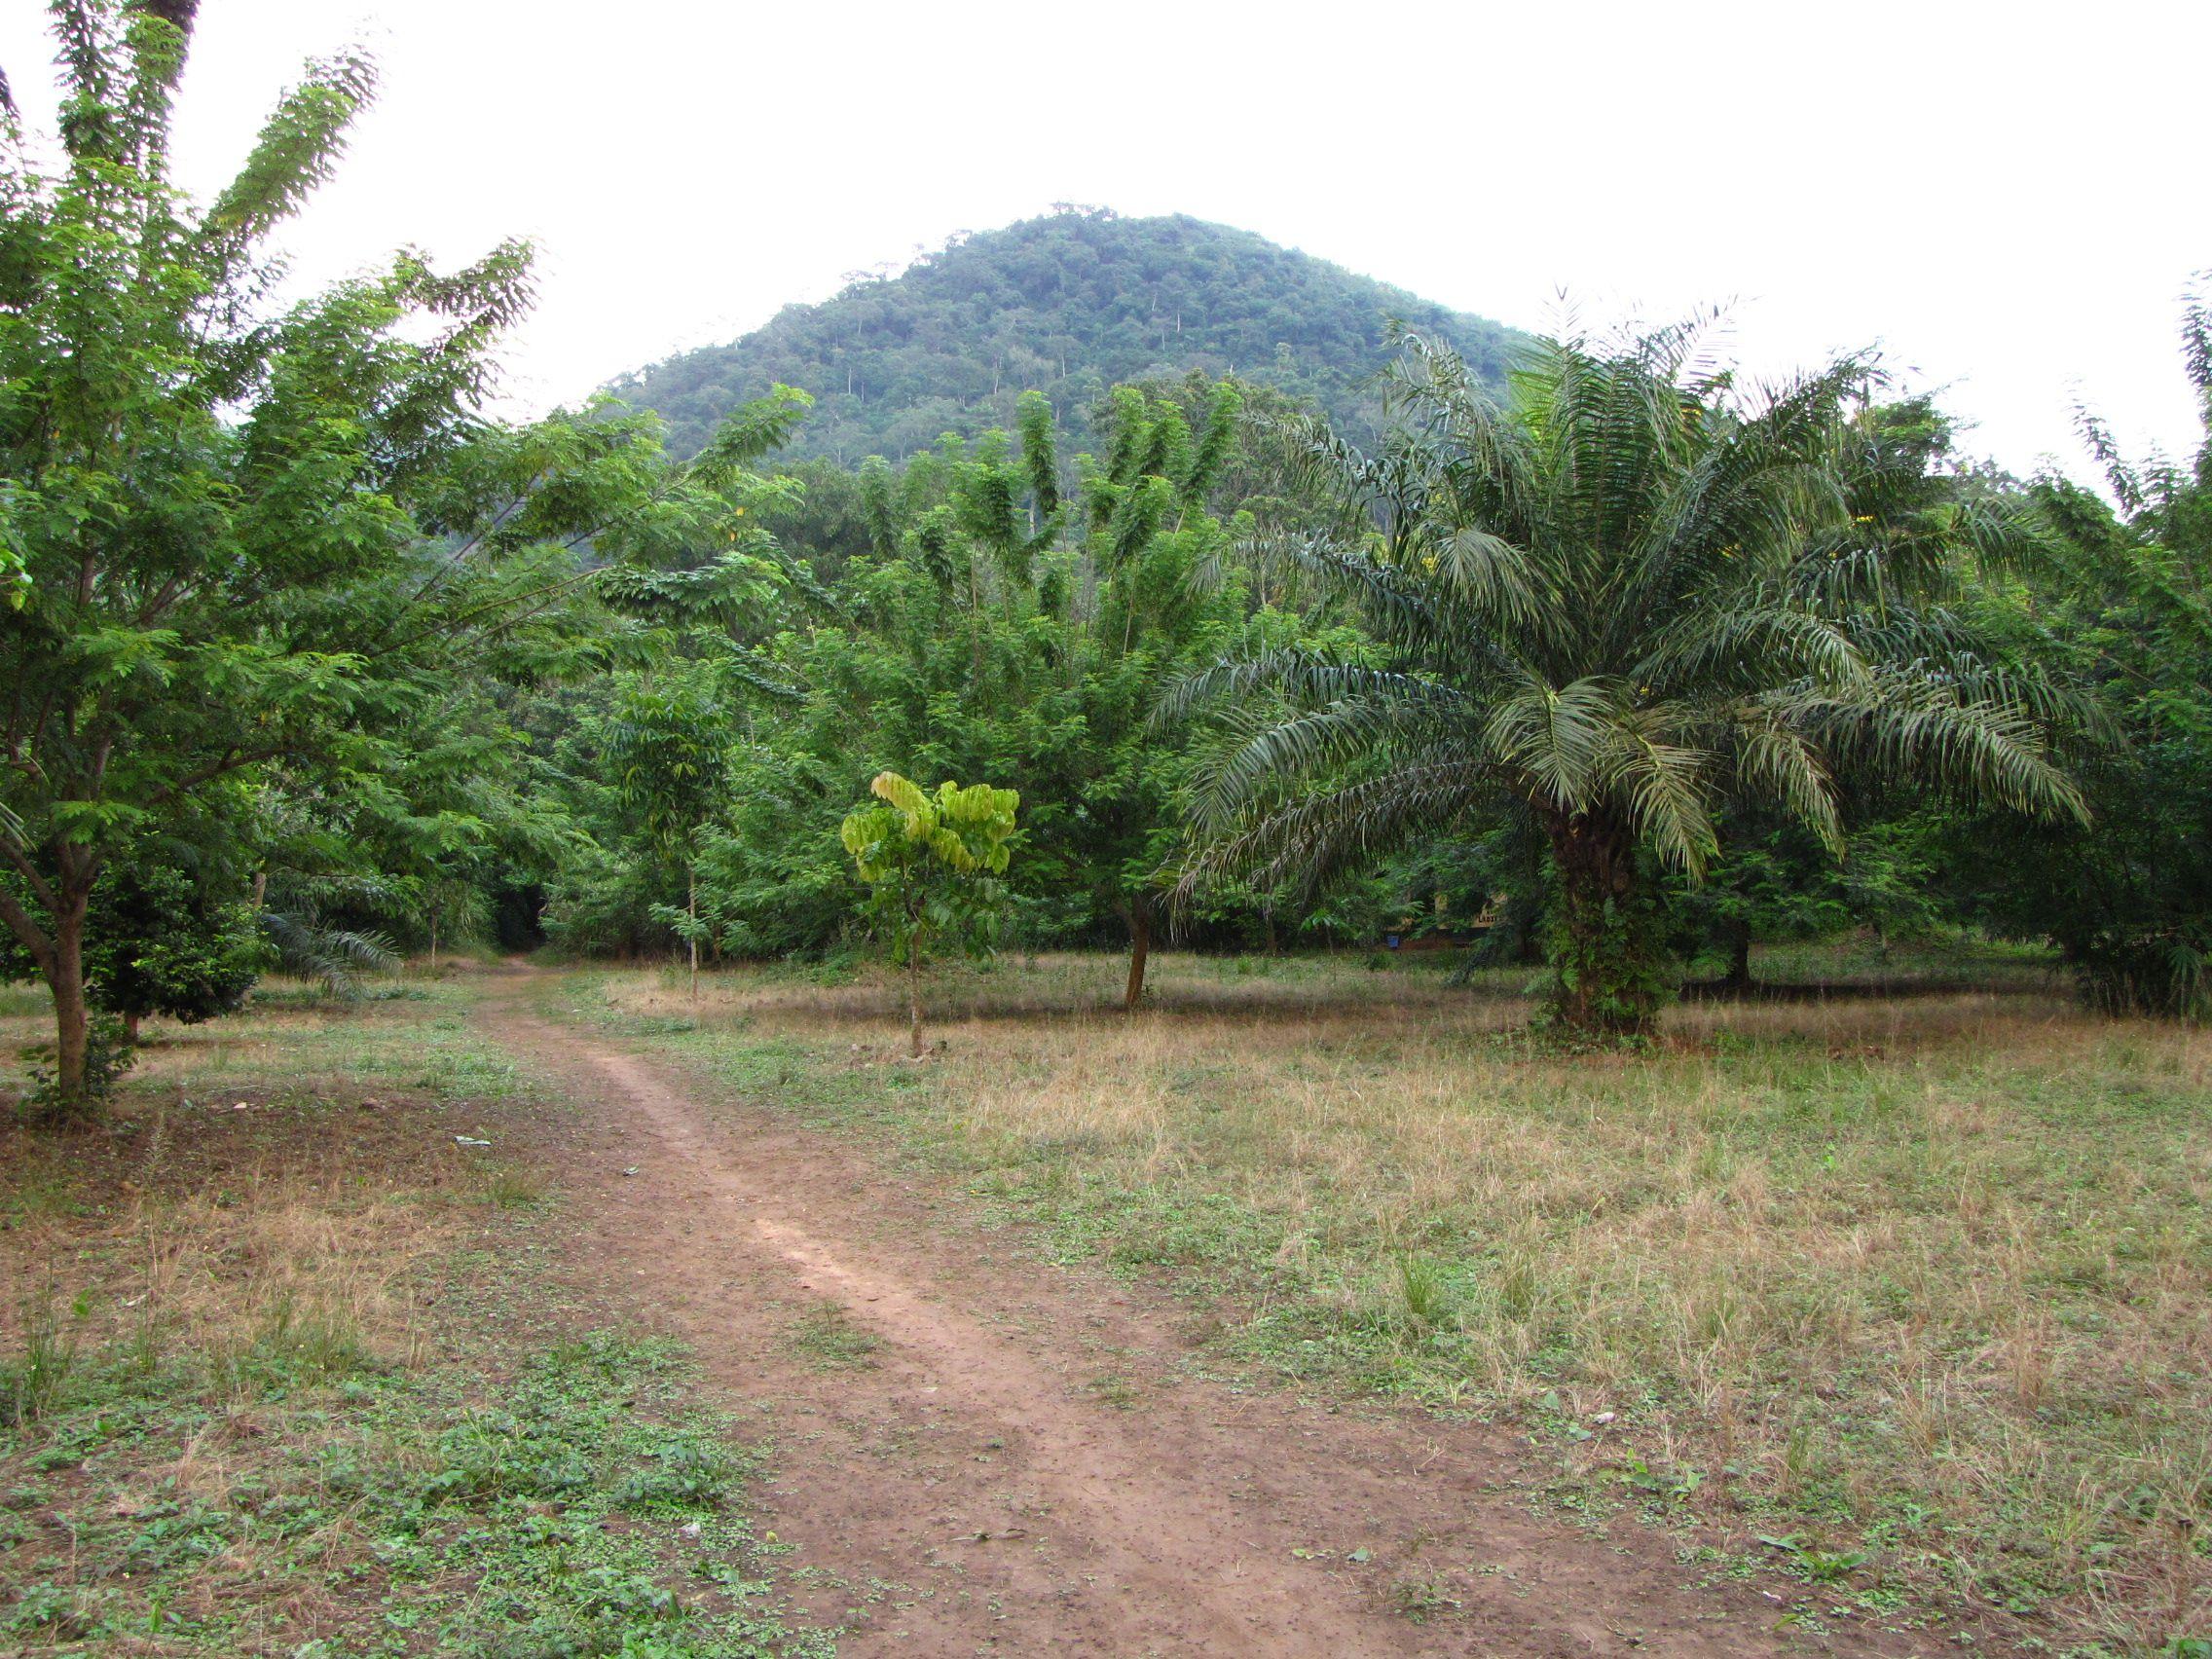 Fancy a hike up Mountain Afadjato, Gbledi Gborgame, Volta Region, Ghana?